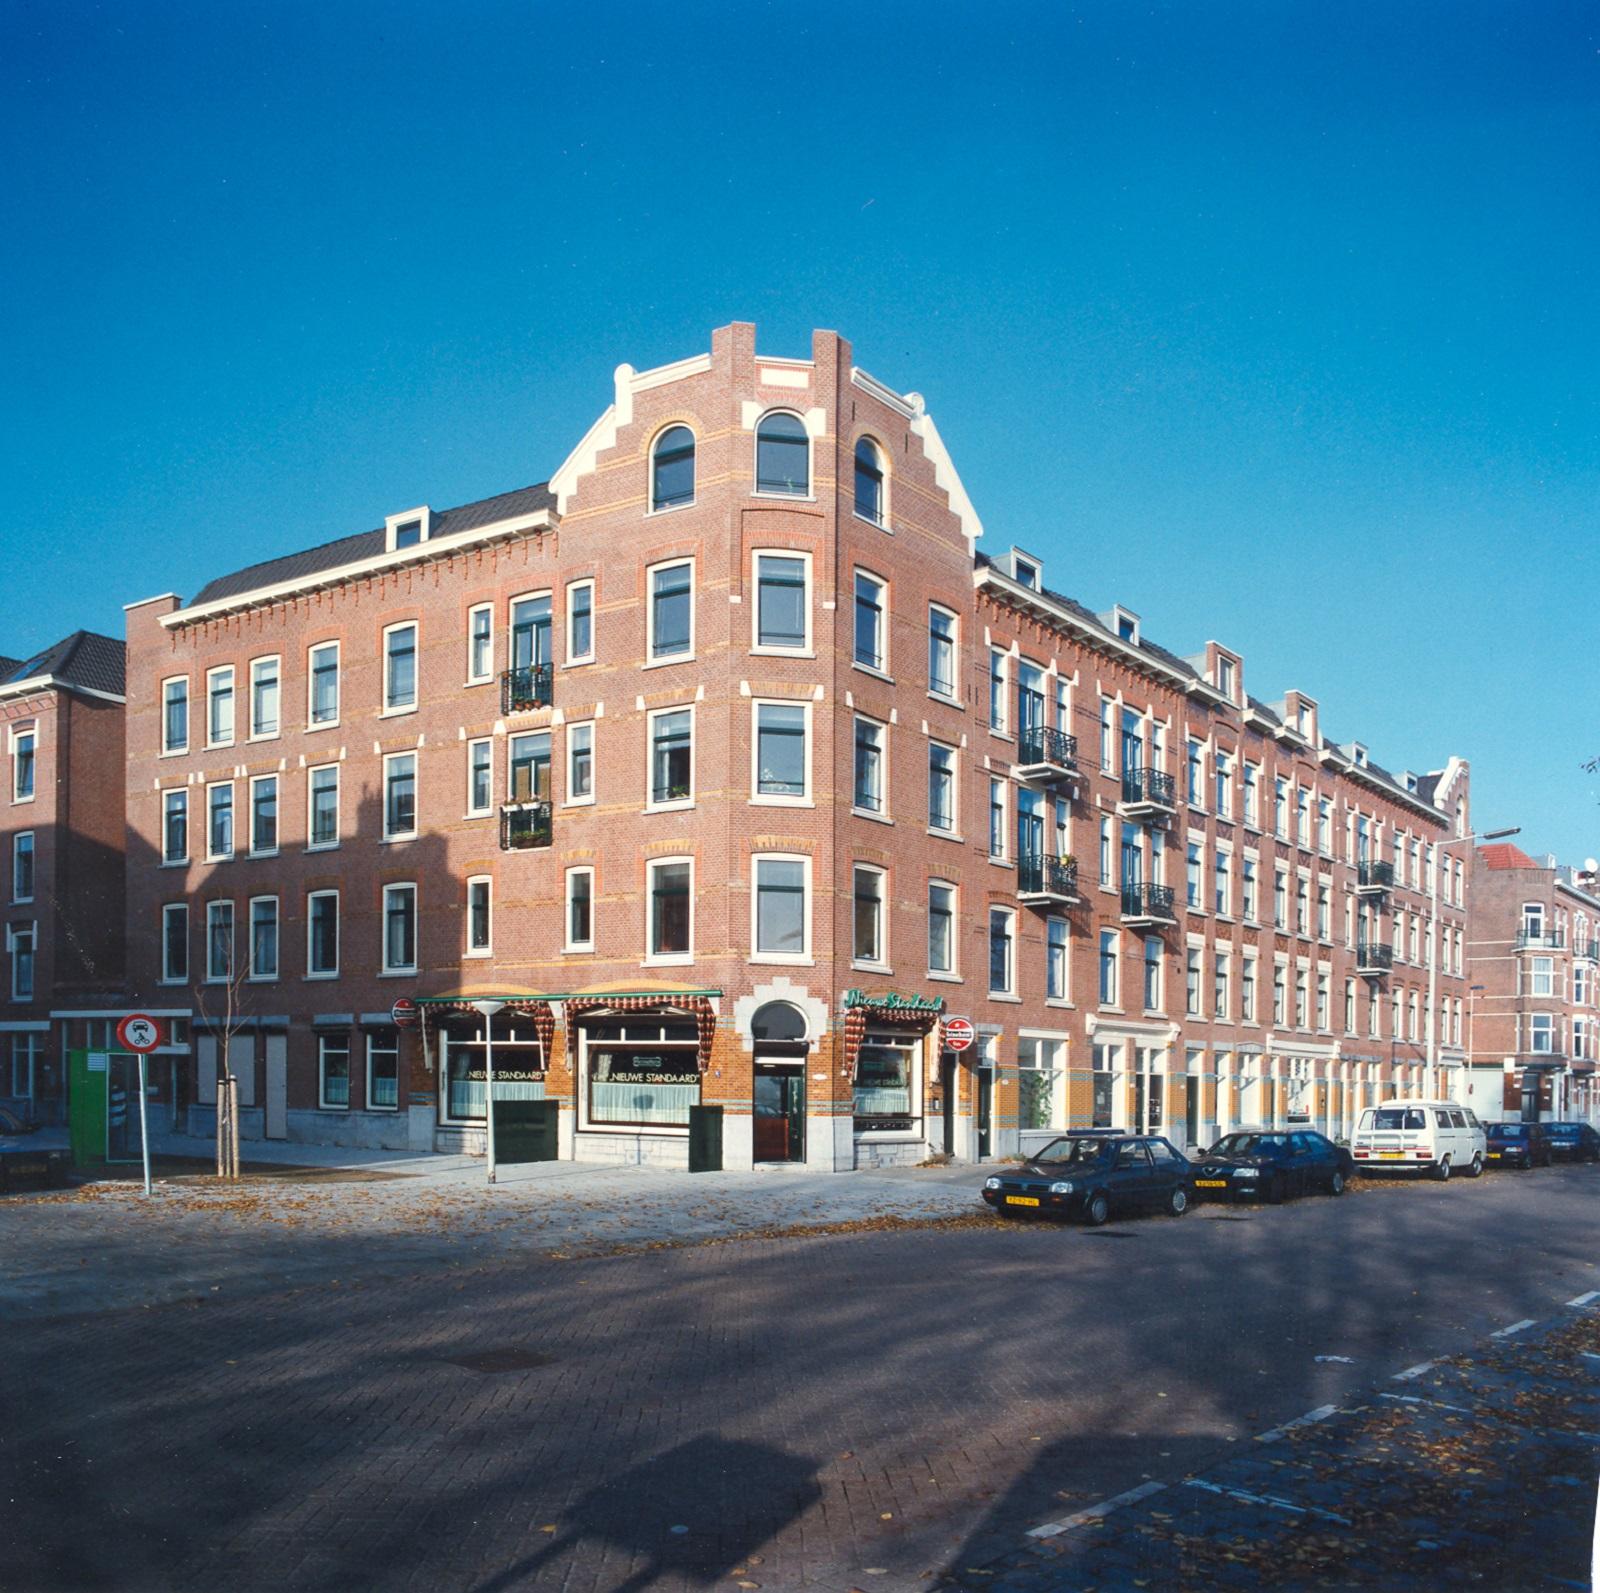 Renovatie sleephelling oeverblok rotterdam rinus roovers architectuur - Architectuur renovatie ...